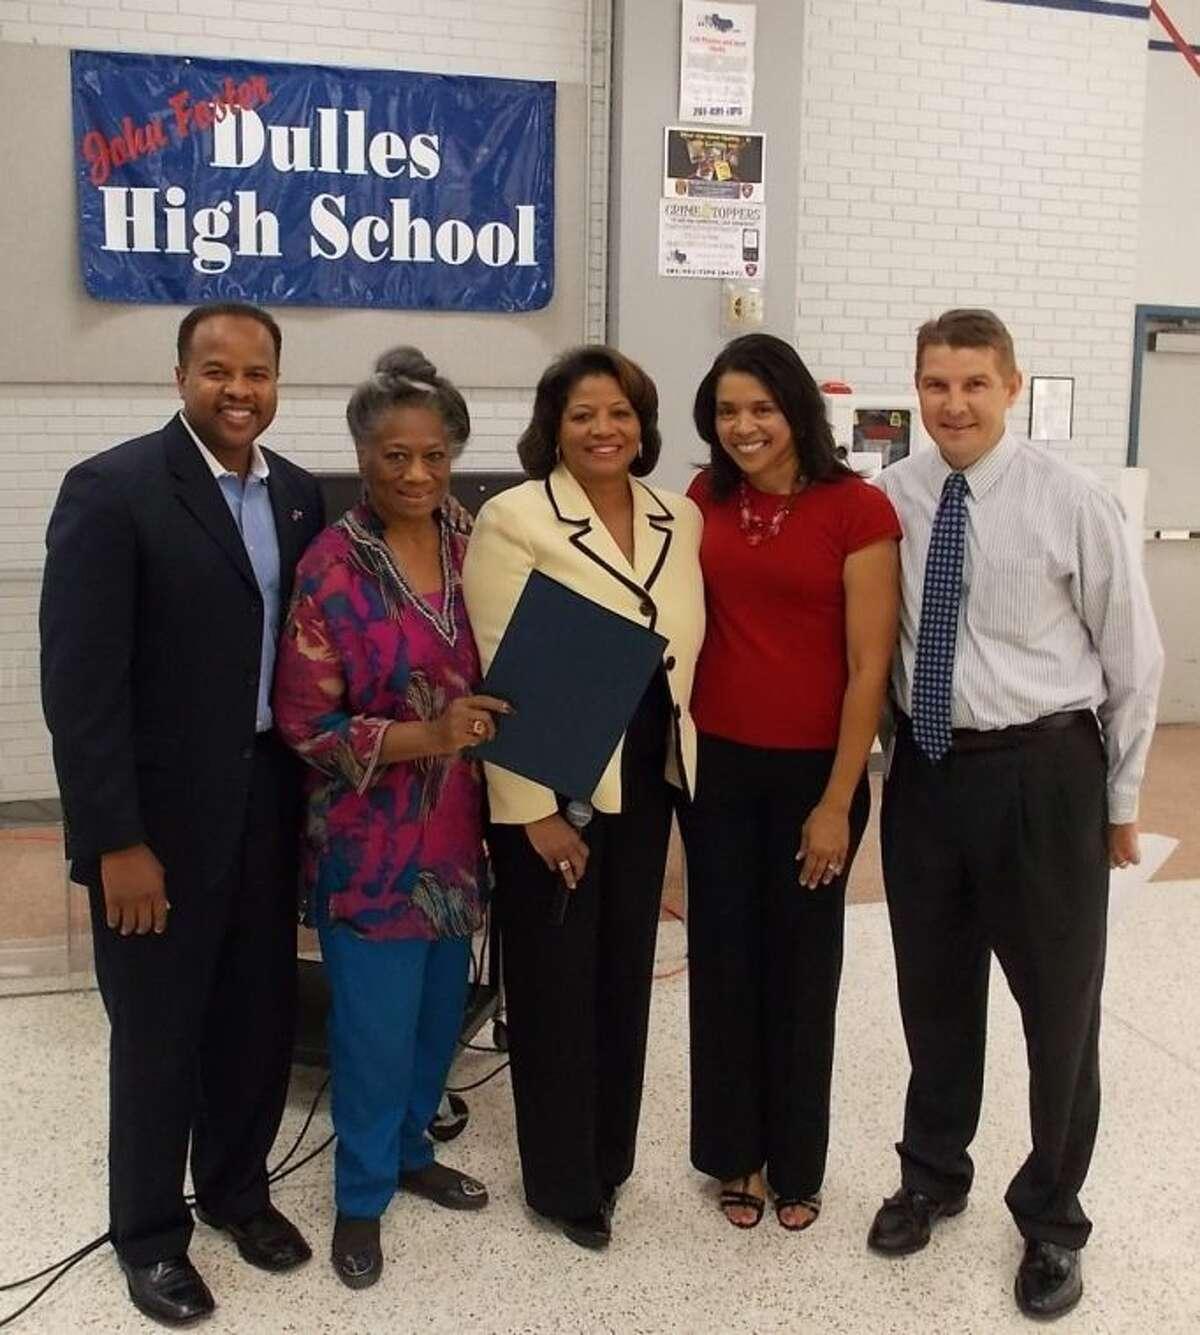 L-R: State Representative Ron Reynolds, Honoree Almeta Scott Crawford, Rhonda Crawford-Arnold, honoree's daughter; Lisa McMillian, honoree's sister; and Ronnie Edwards, principal of Dulles High School.